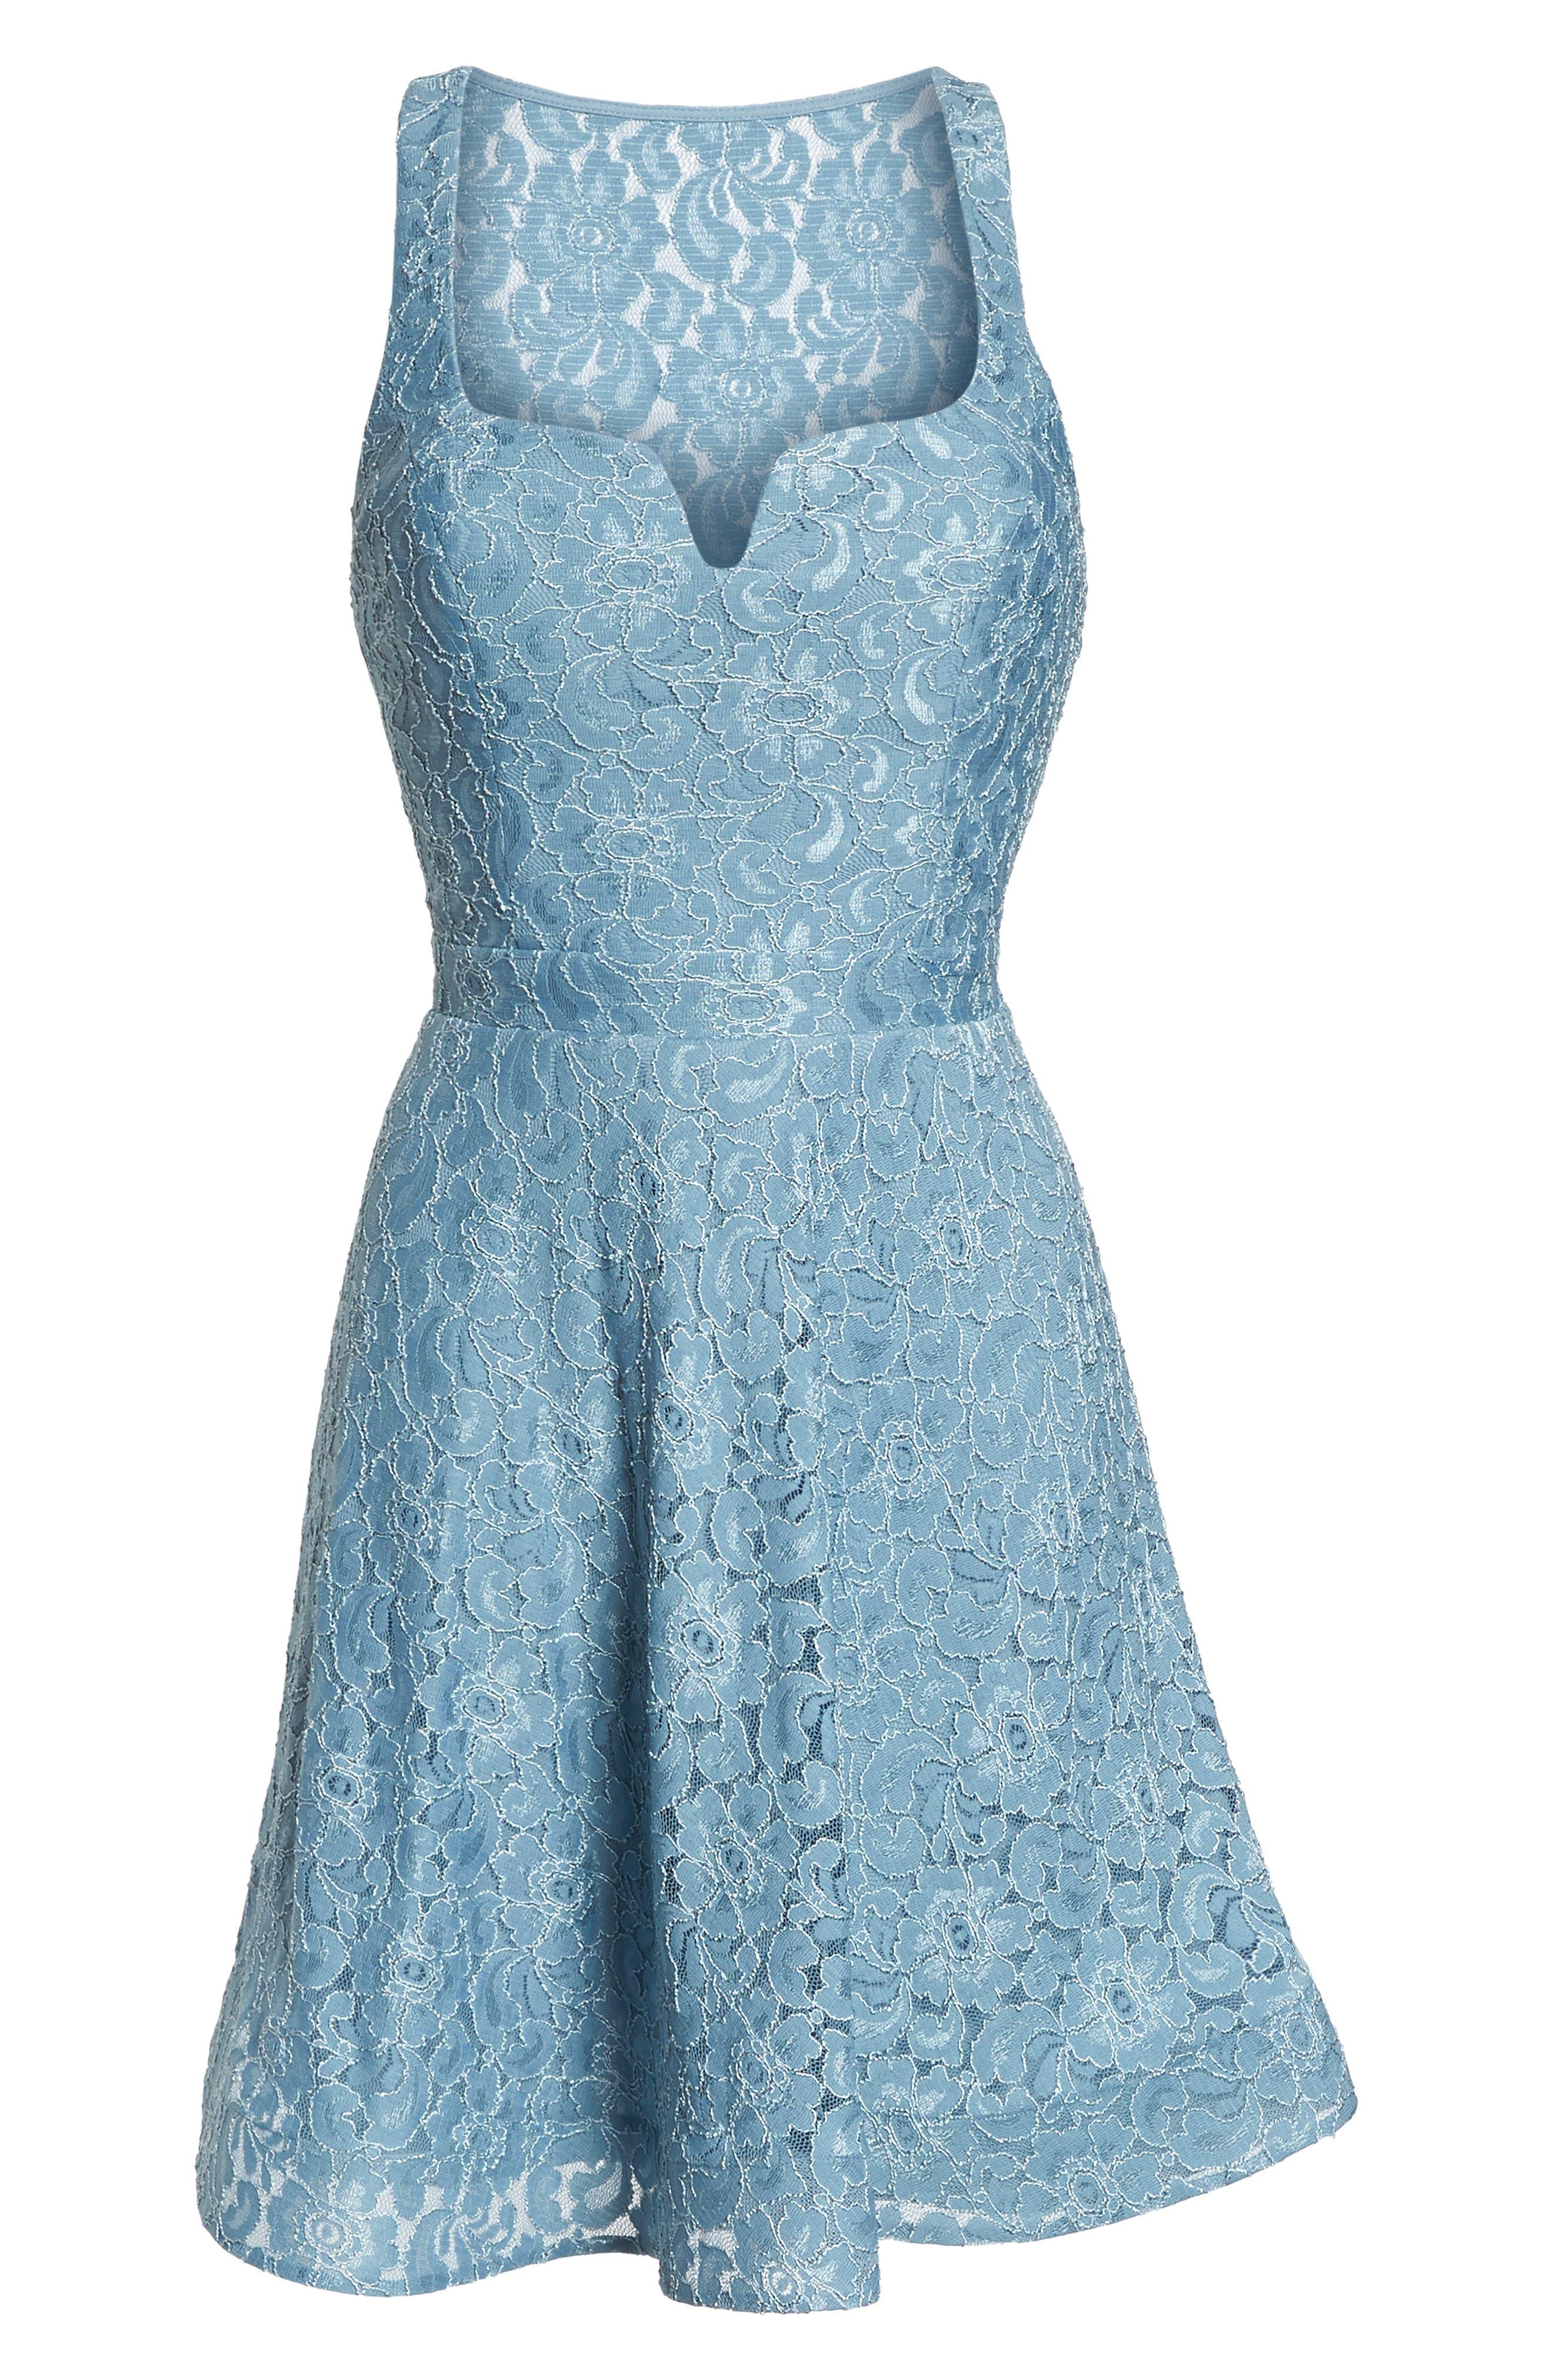 Notch Front Lace Fit & Flare Dress,                             Alternate thumbnail 6, color,                             483